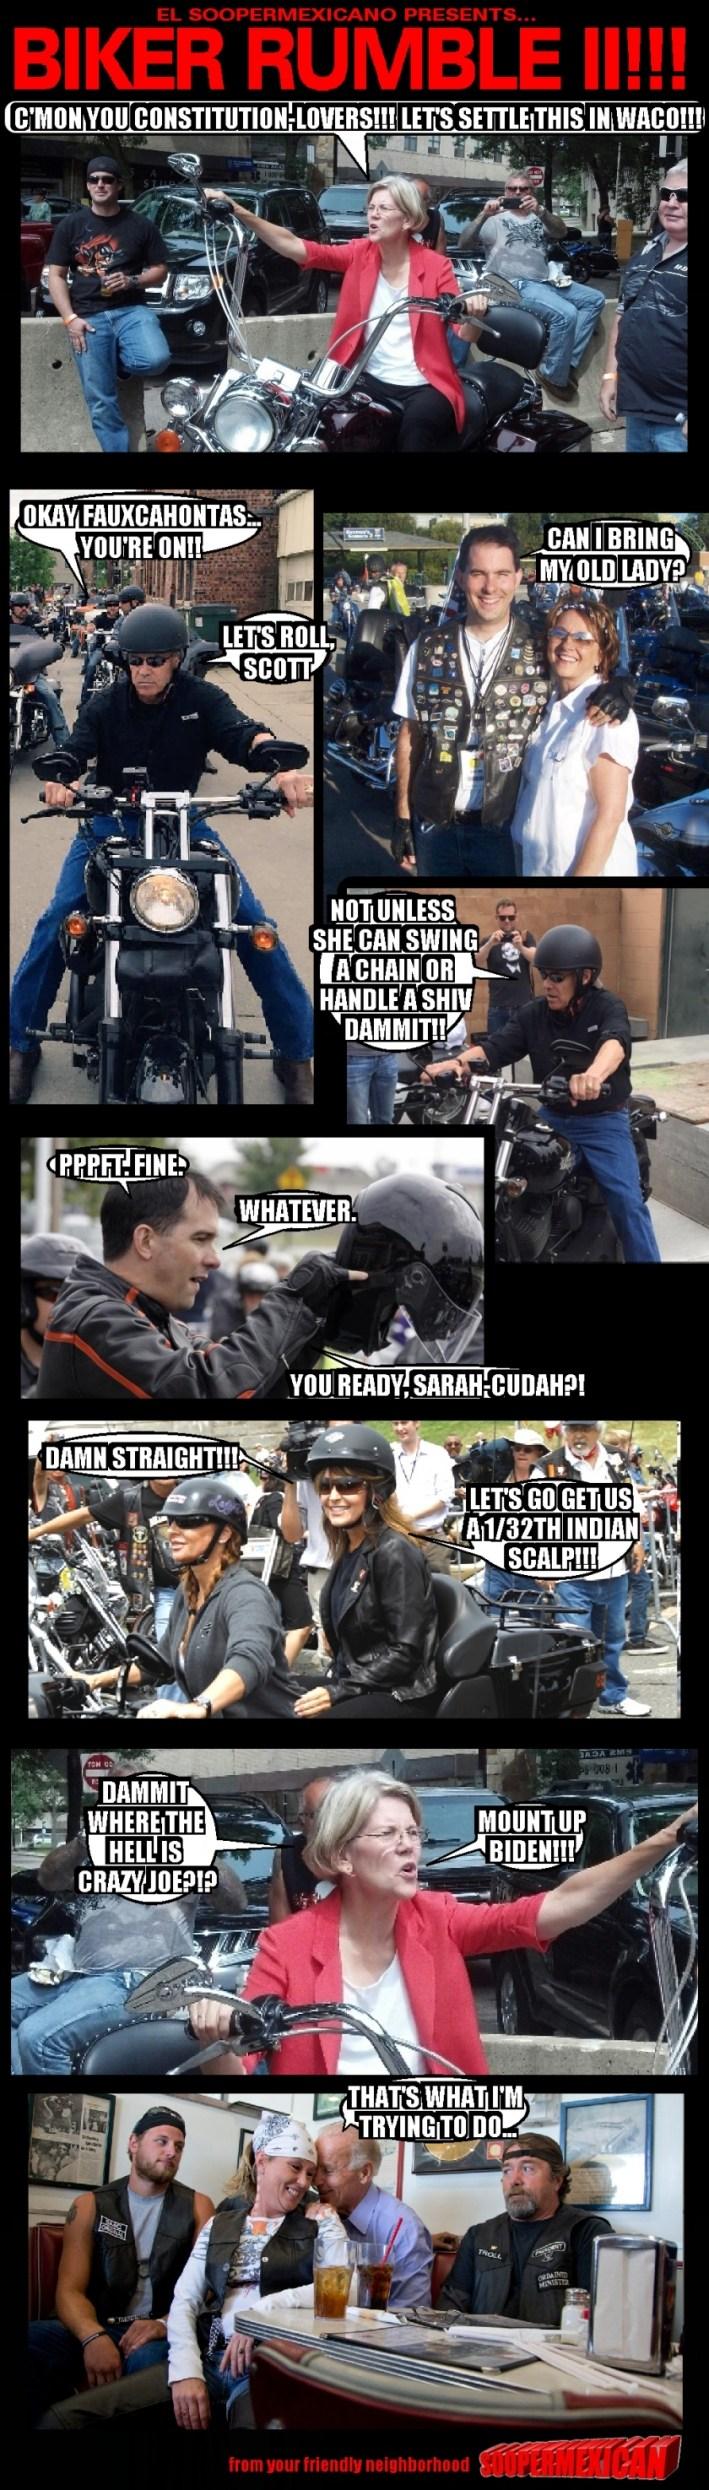 Biker politicians-4